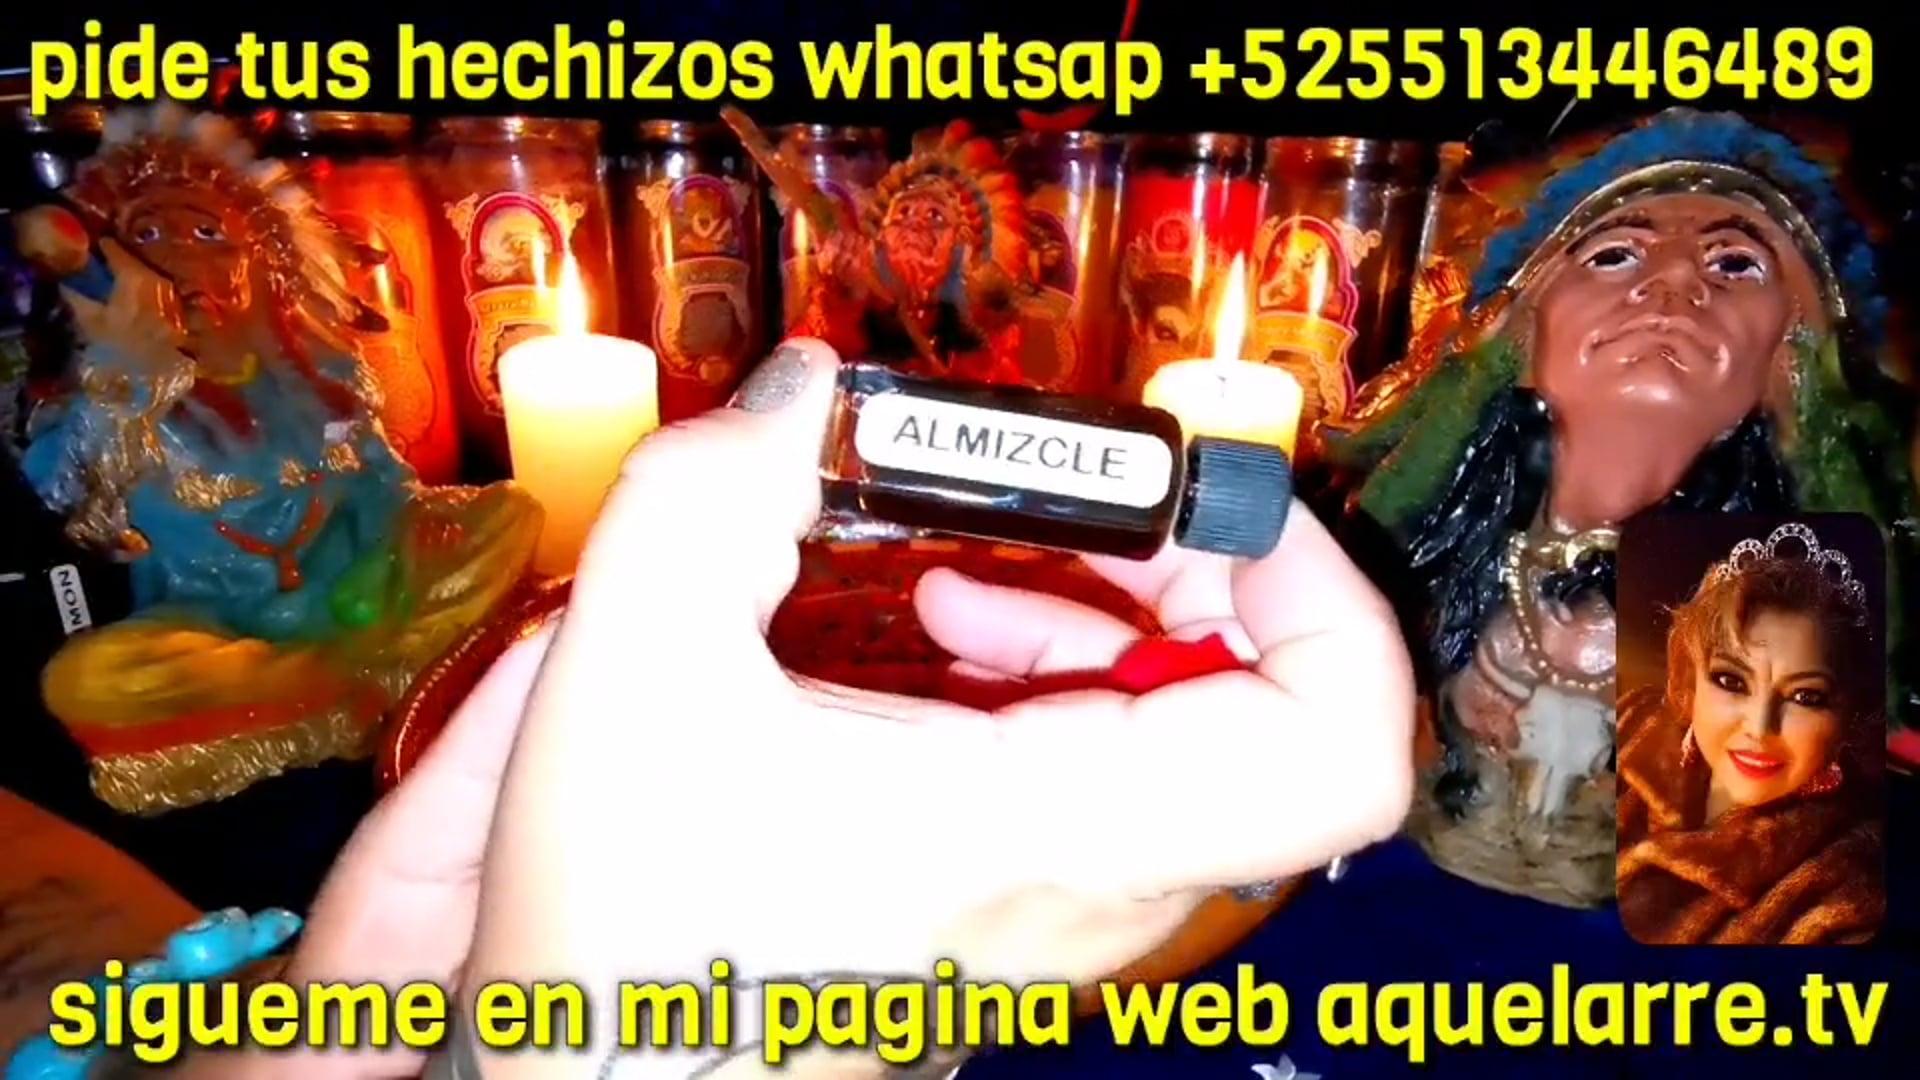 HECHIZO ATRAYENTE DE AMOR TE VERÁ MAS BELLA